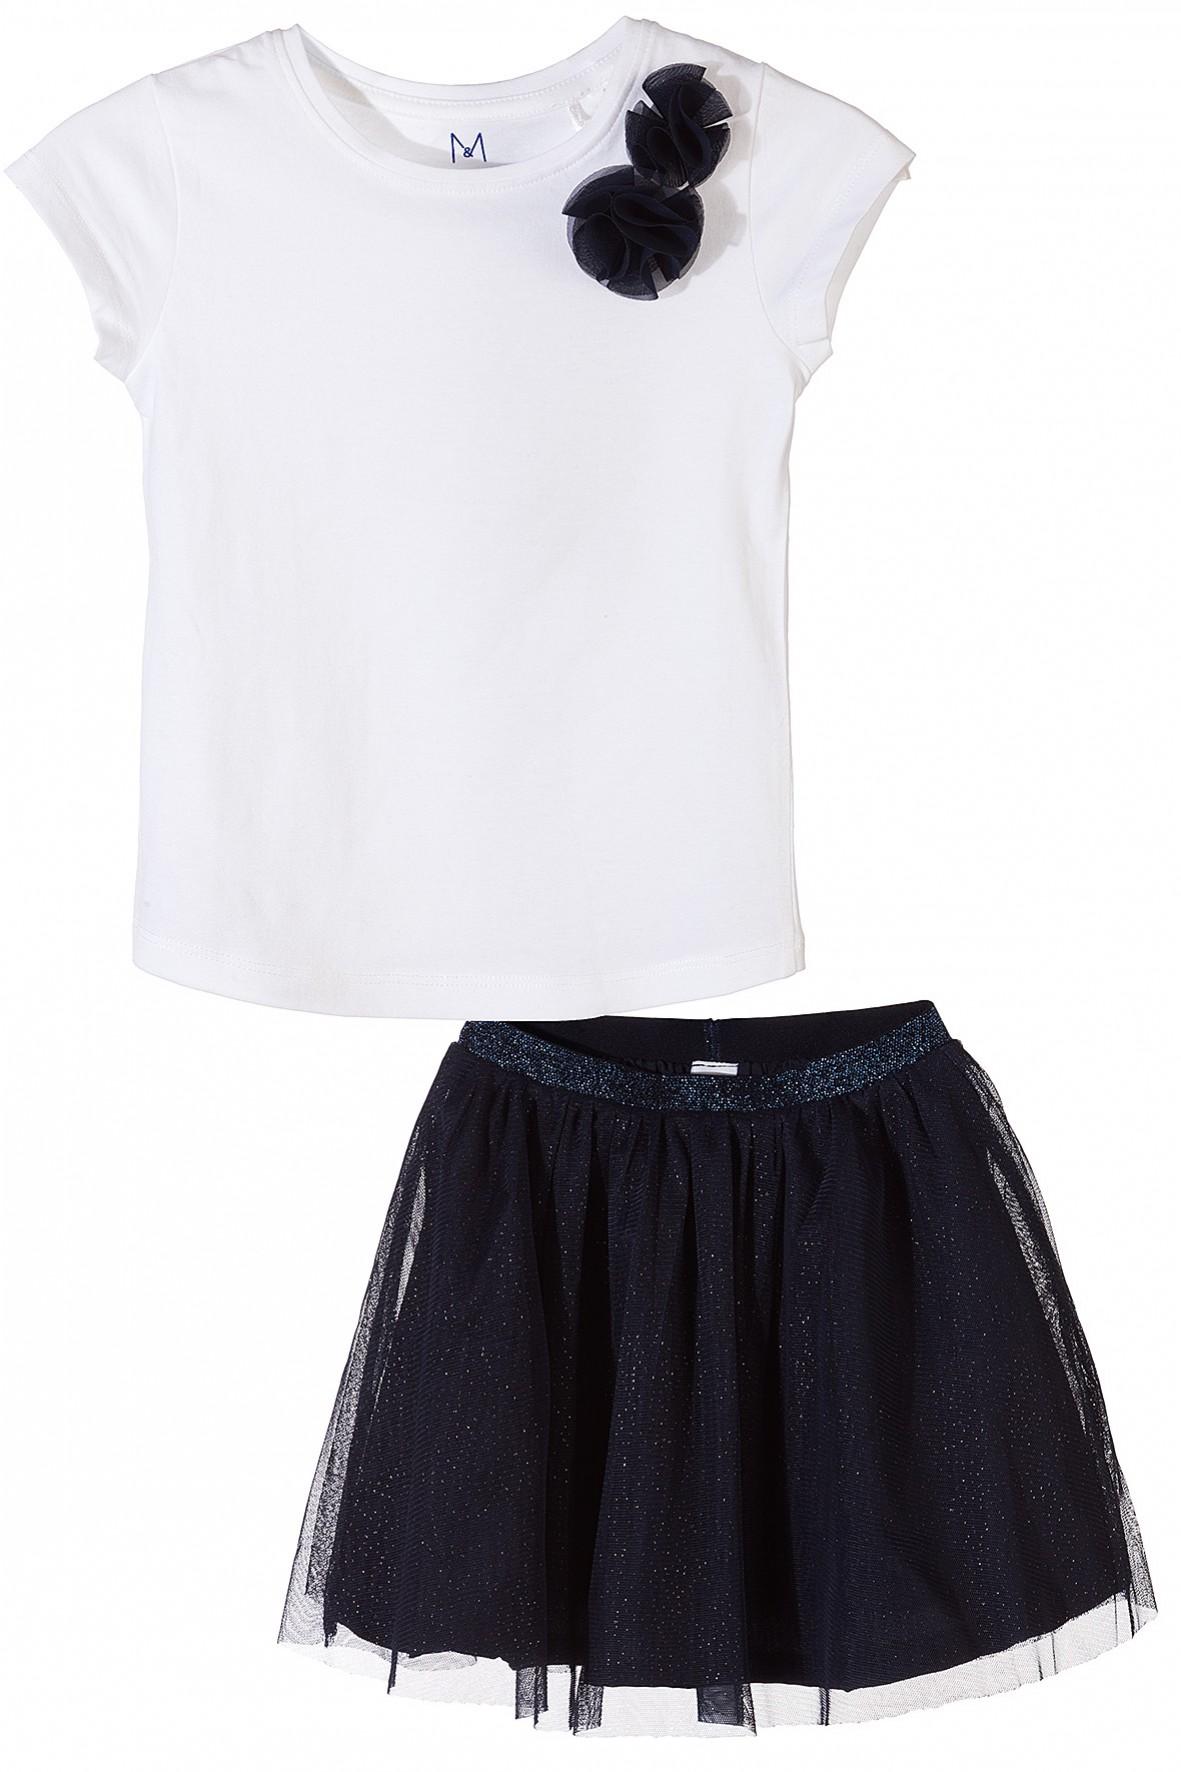 Biały t-shirt + granatowa spódnica